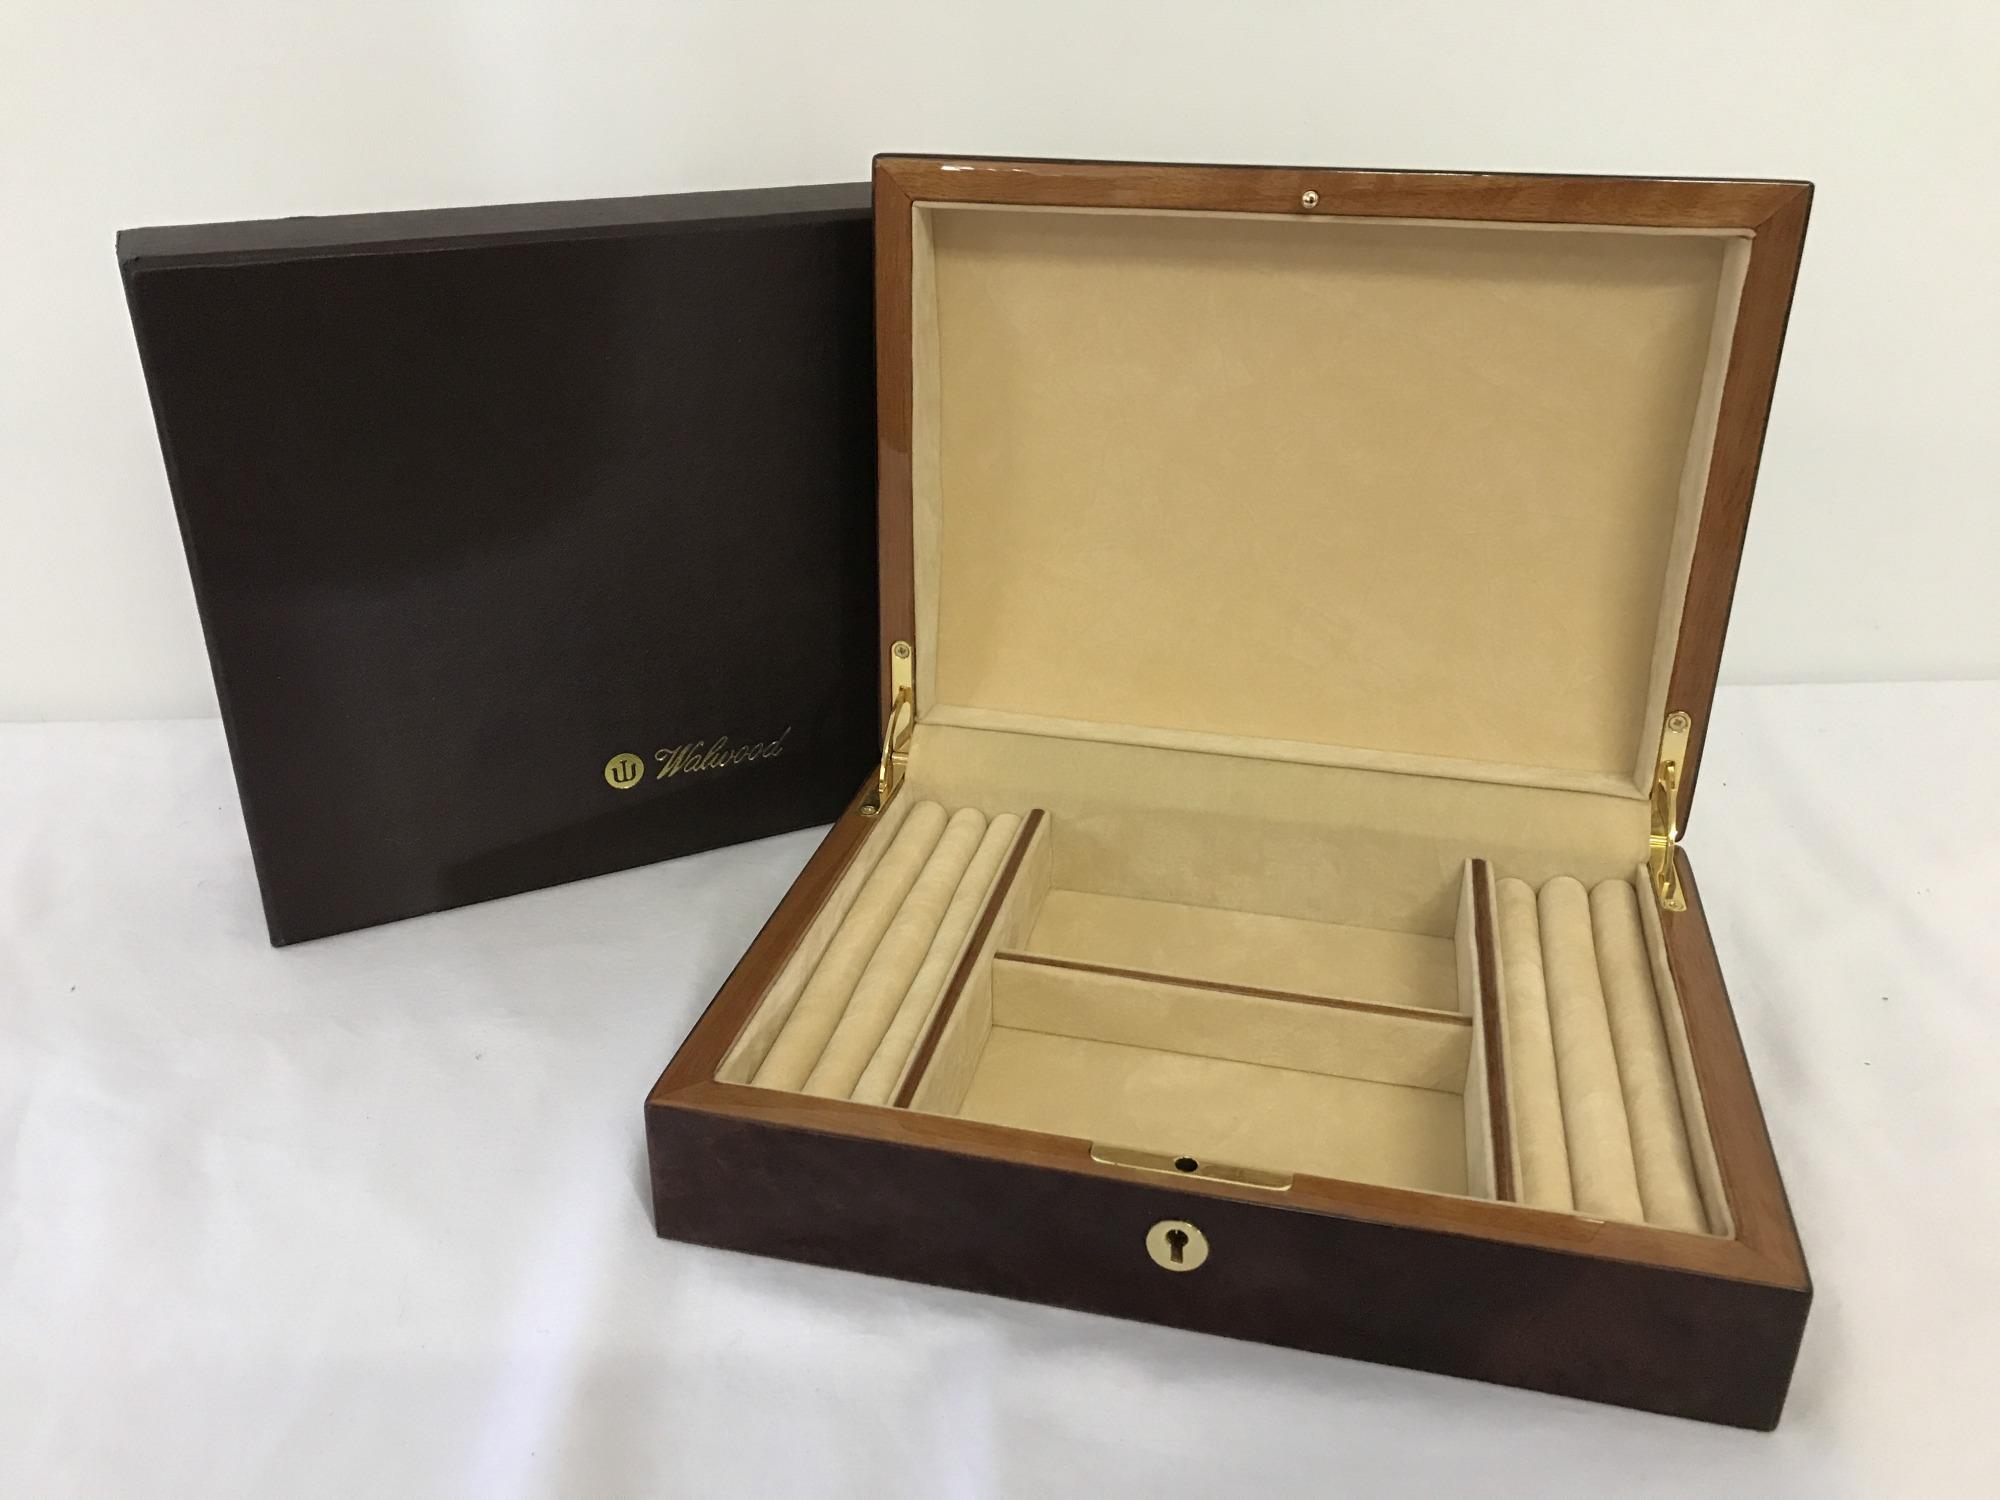 Lot 5 - A boxed red Birdseye maple jewellery box by Walwood.